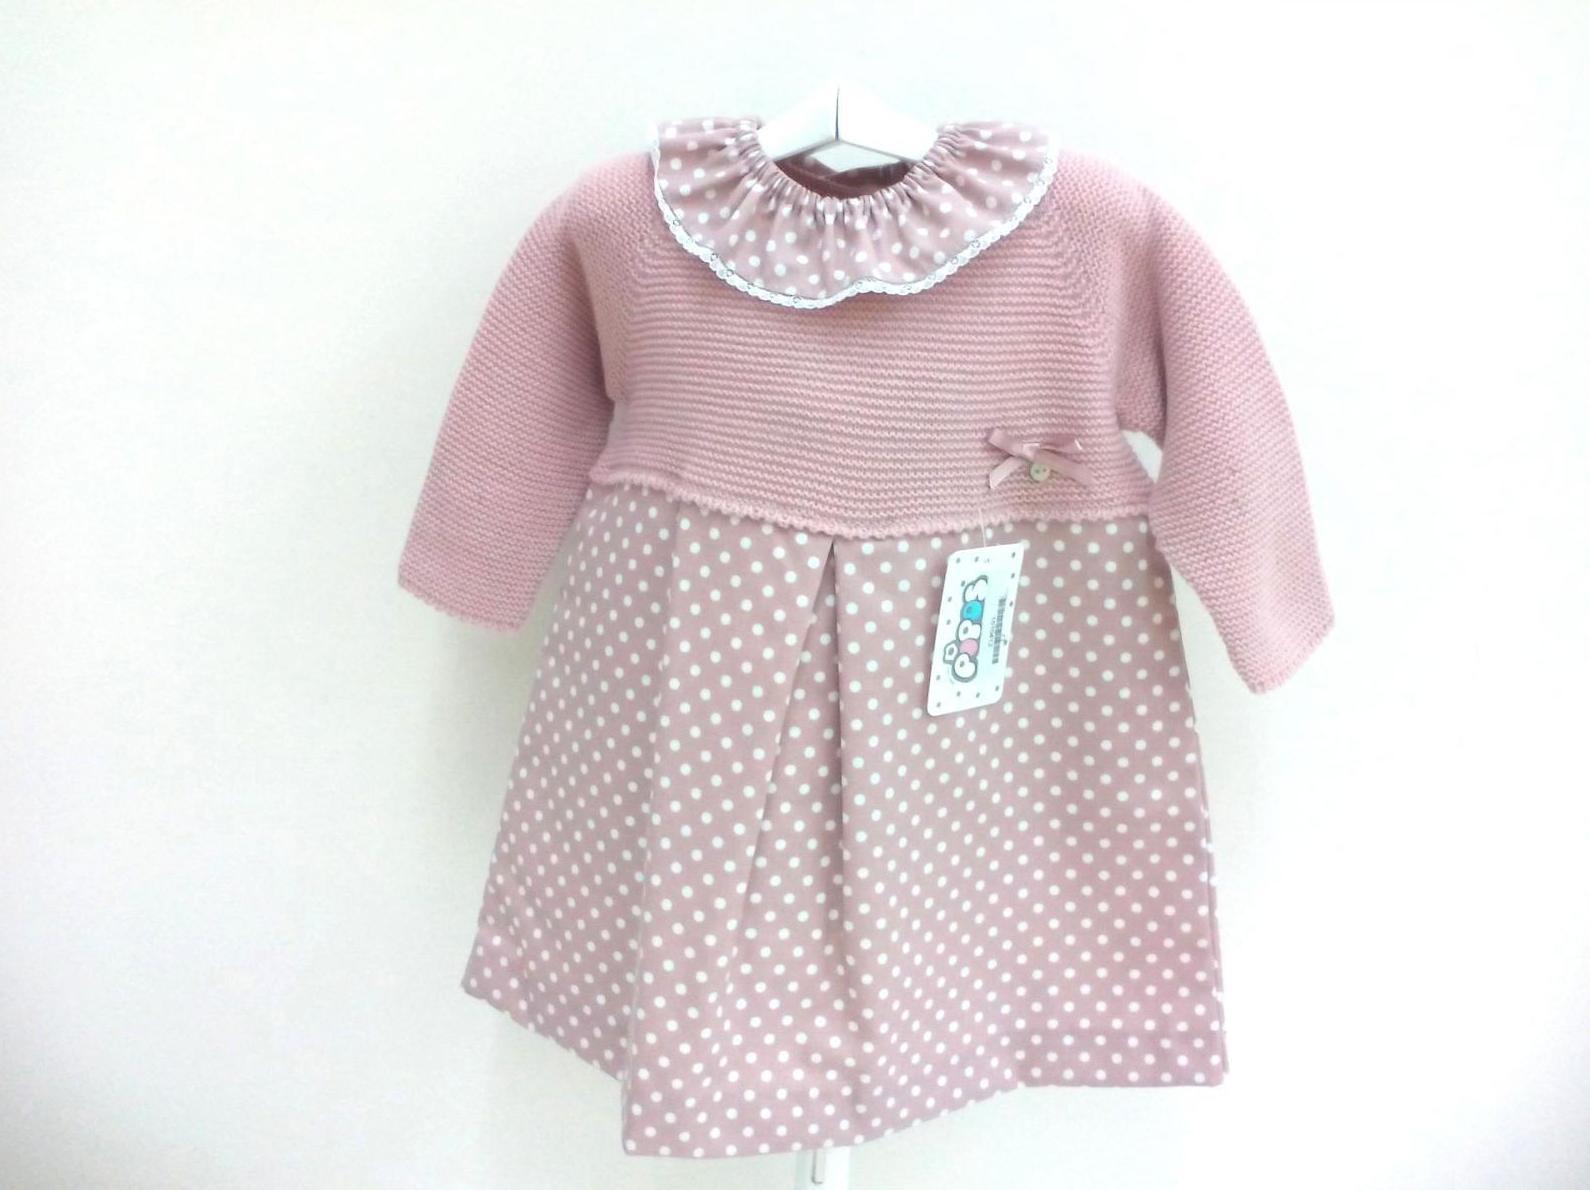 Vestido para niña en rosa empolvado de Pipos